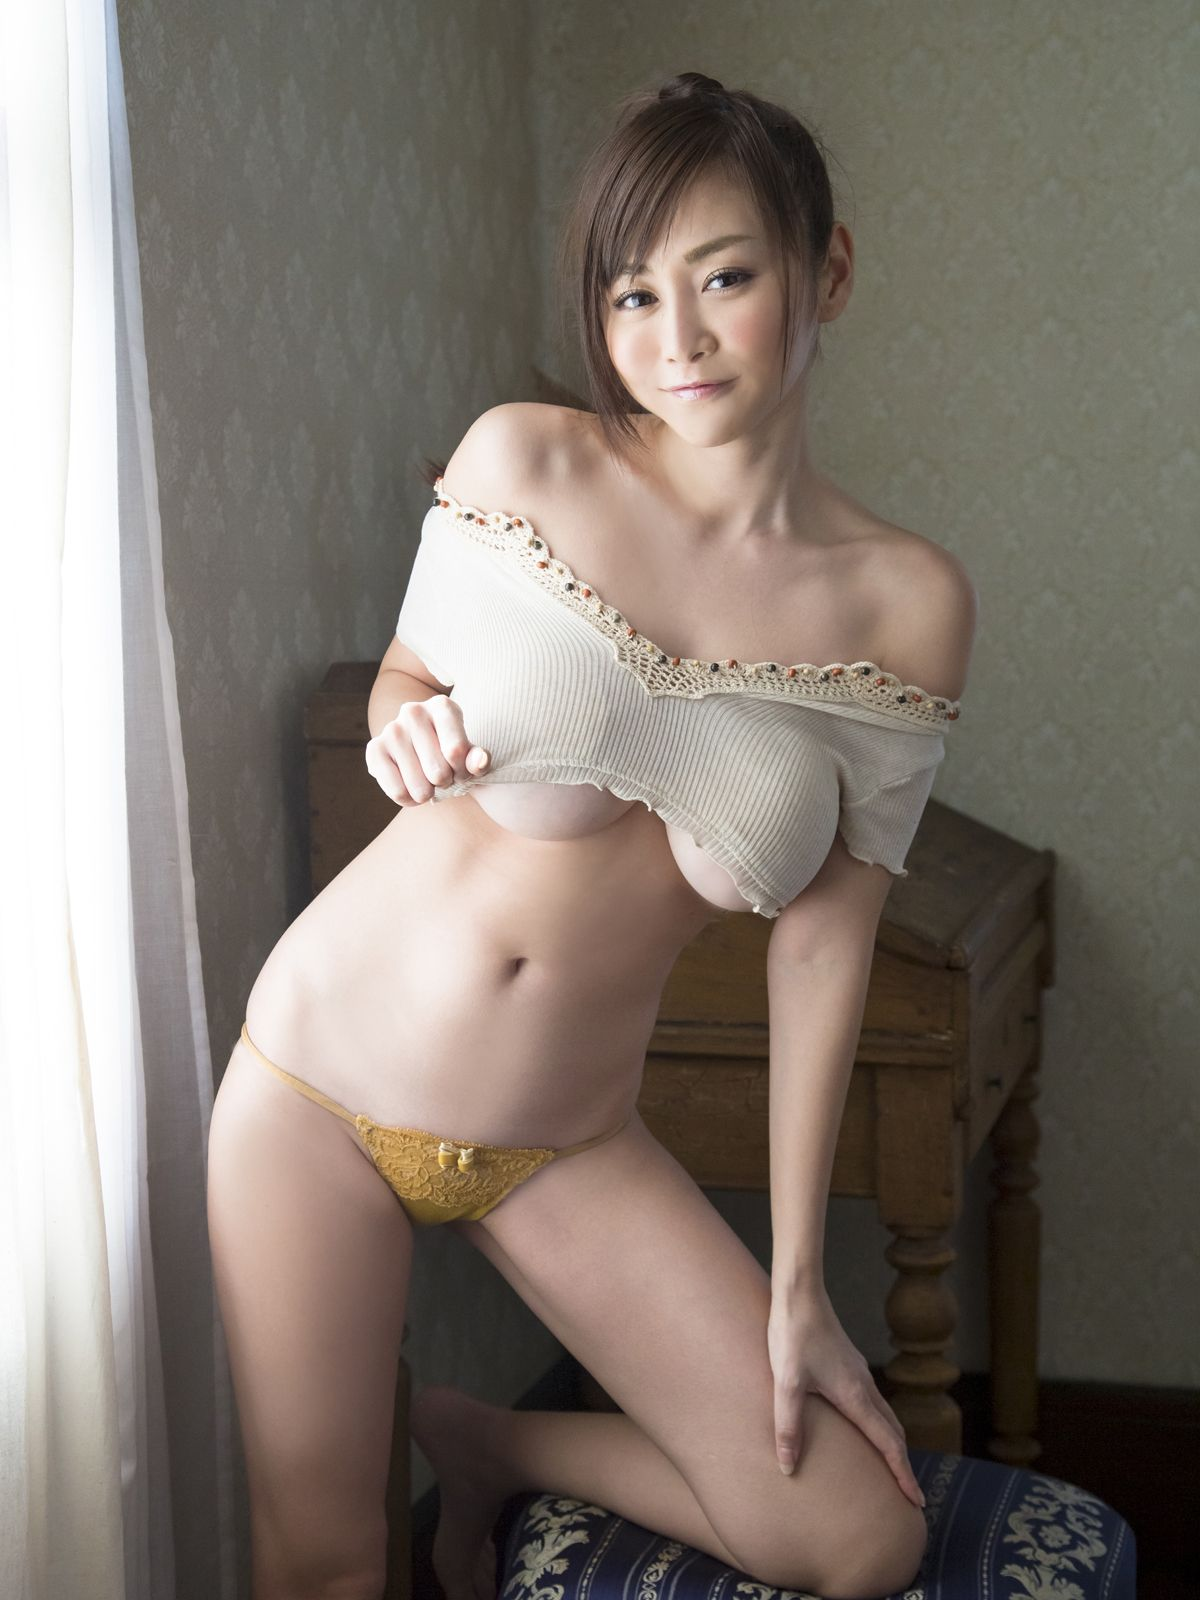 Asian adult upload